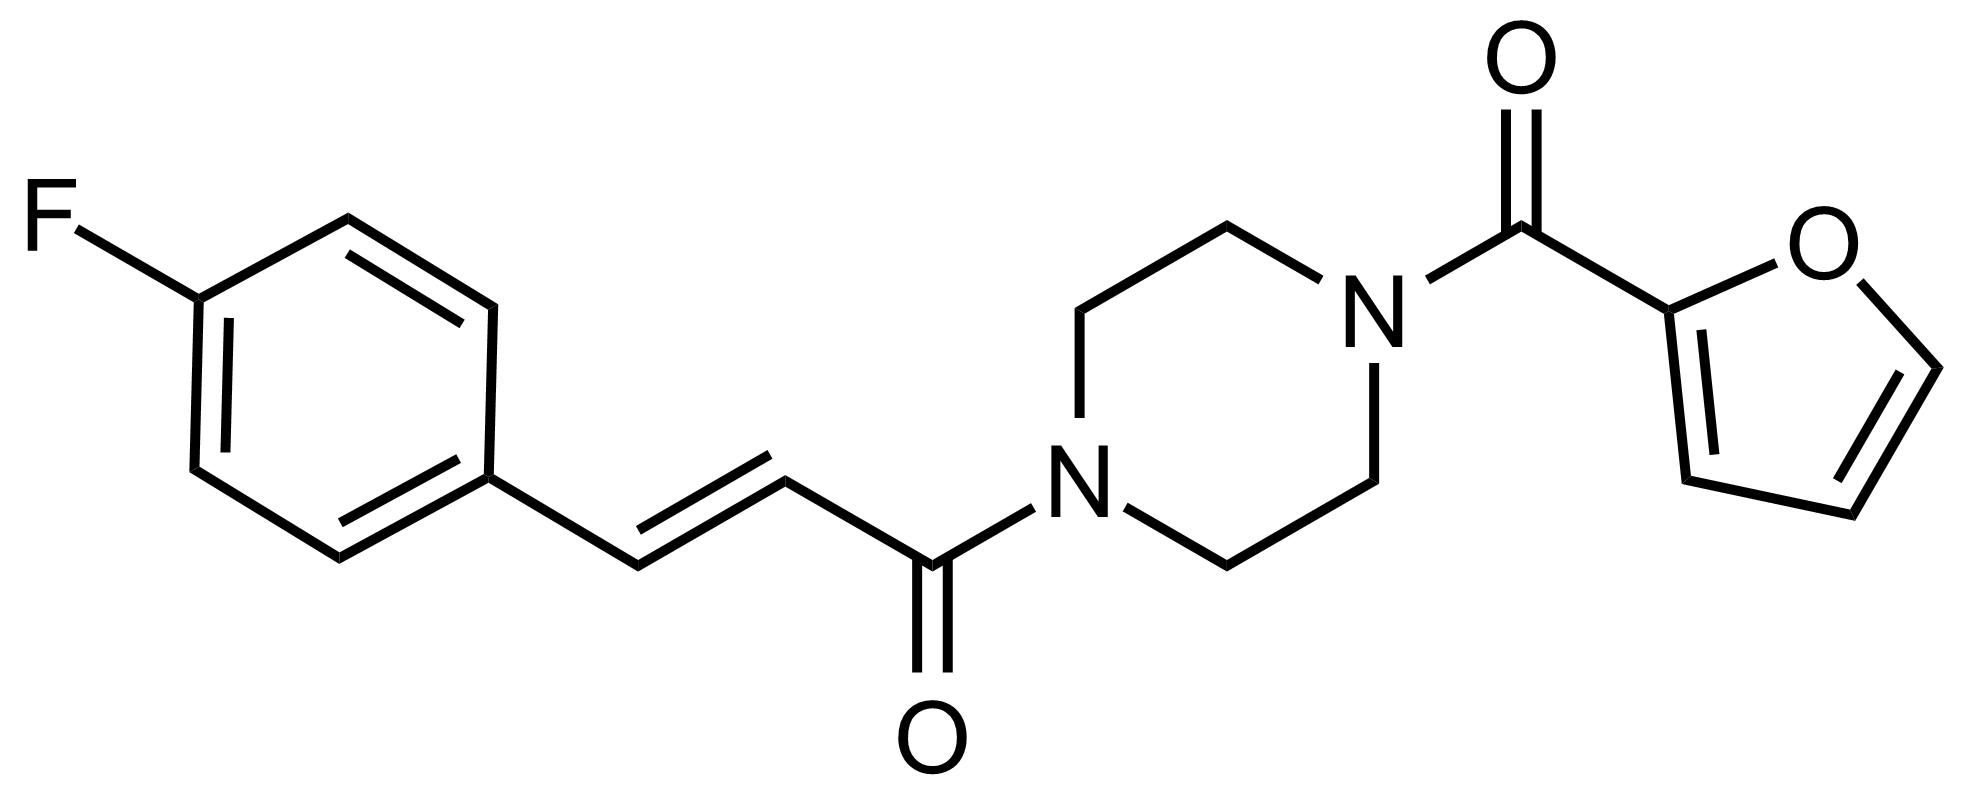 Structure of (E)-3-(4-Fluorophenyl)-1-(4-(furan-2-carbonyl)piperazin-1-yl)prop-2-en-1-one